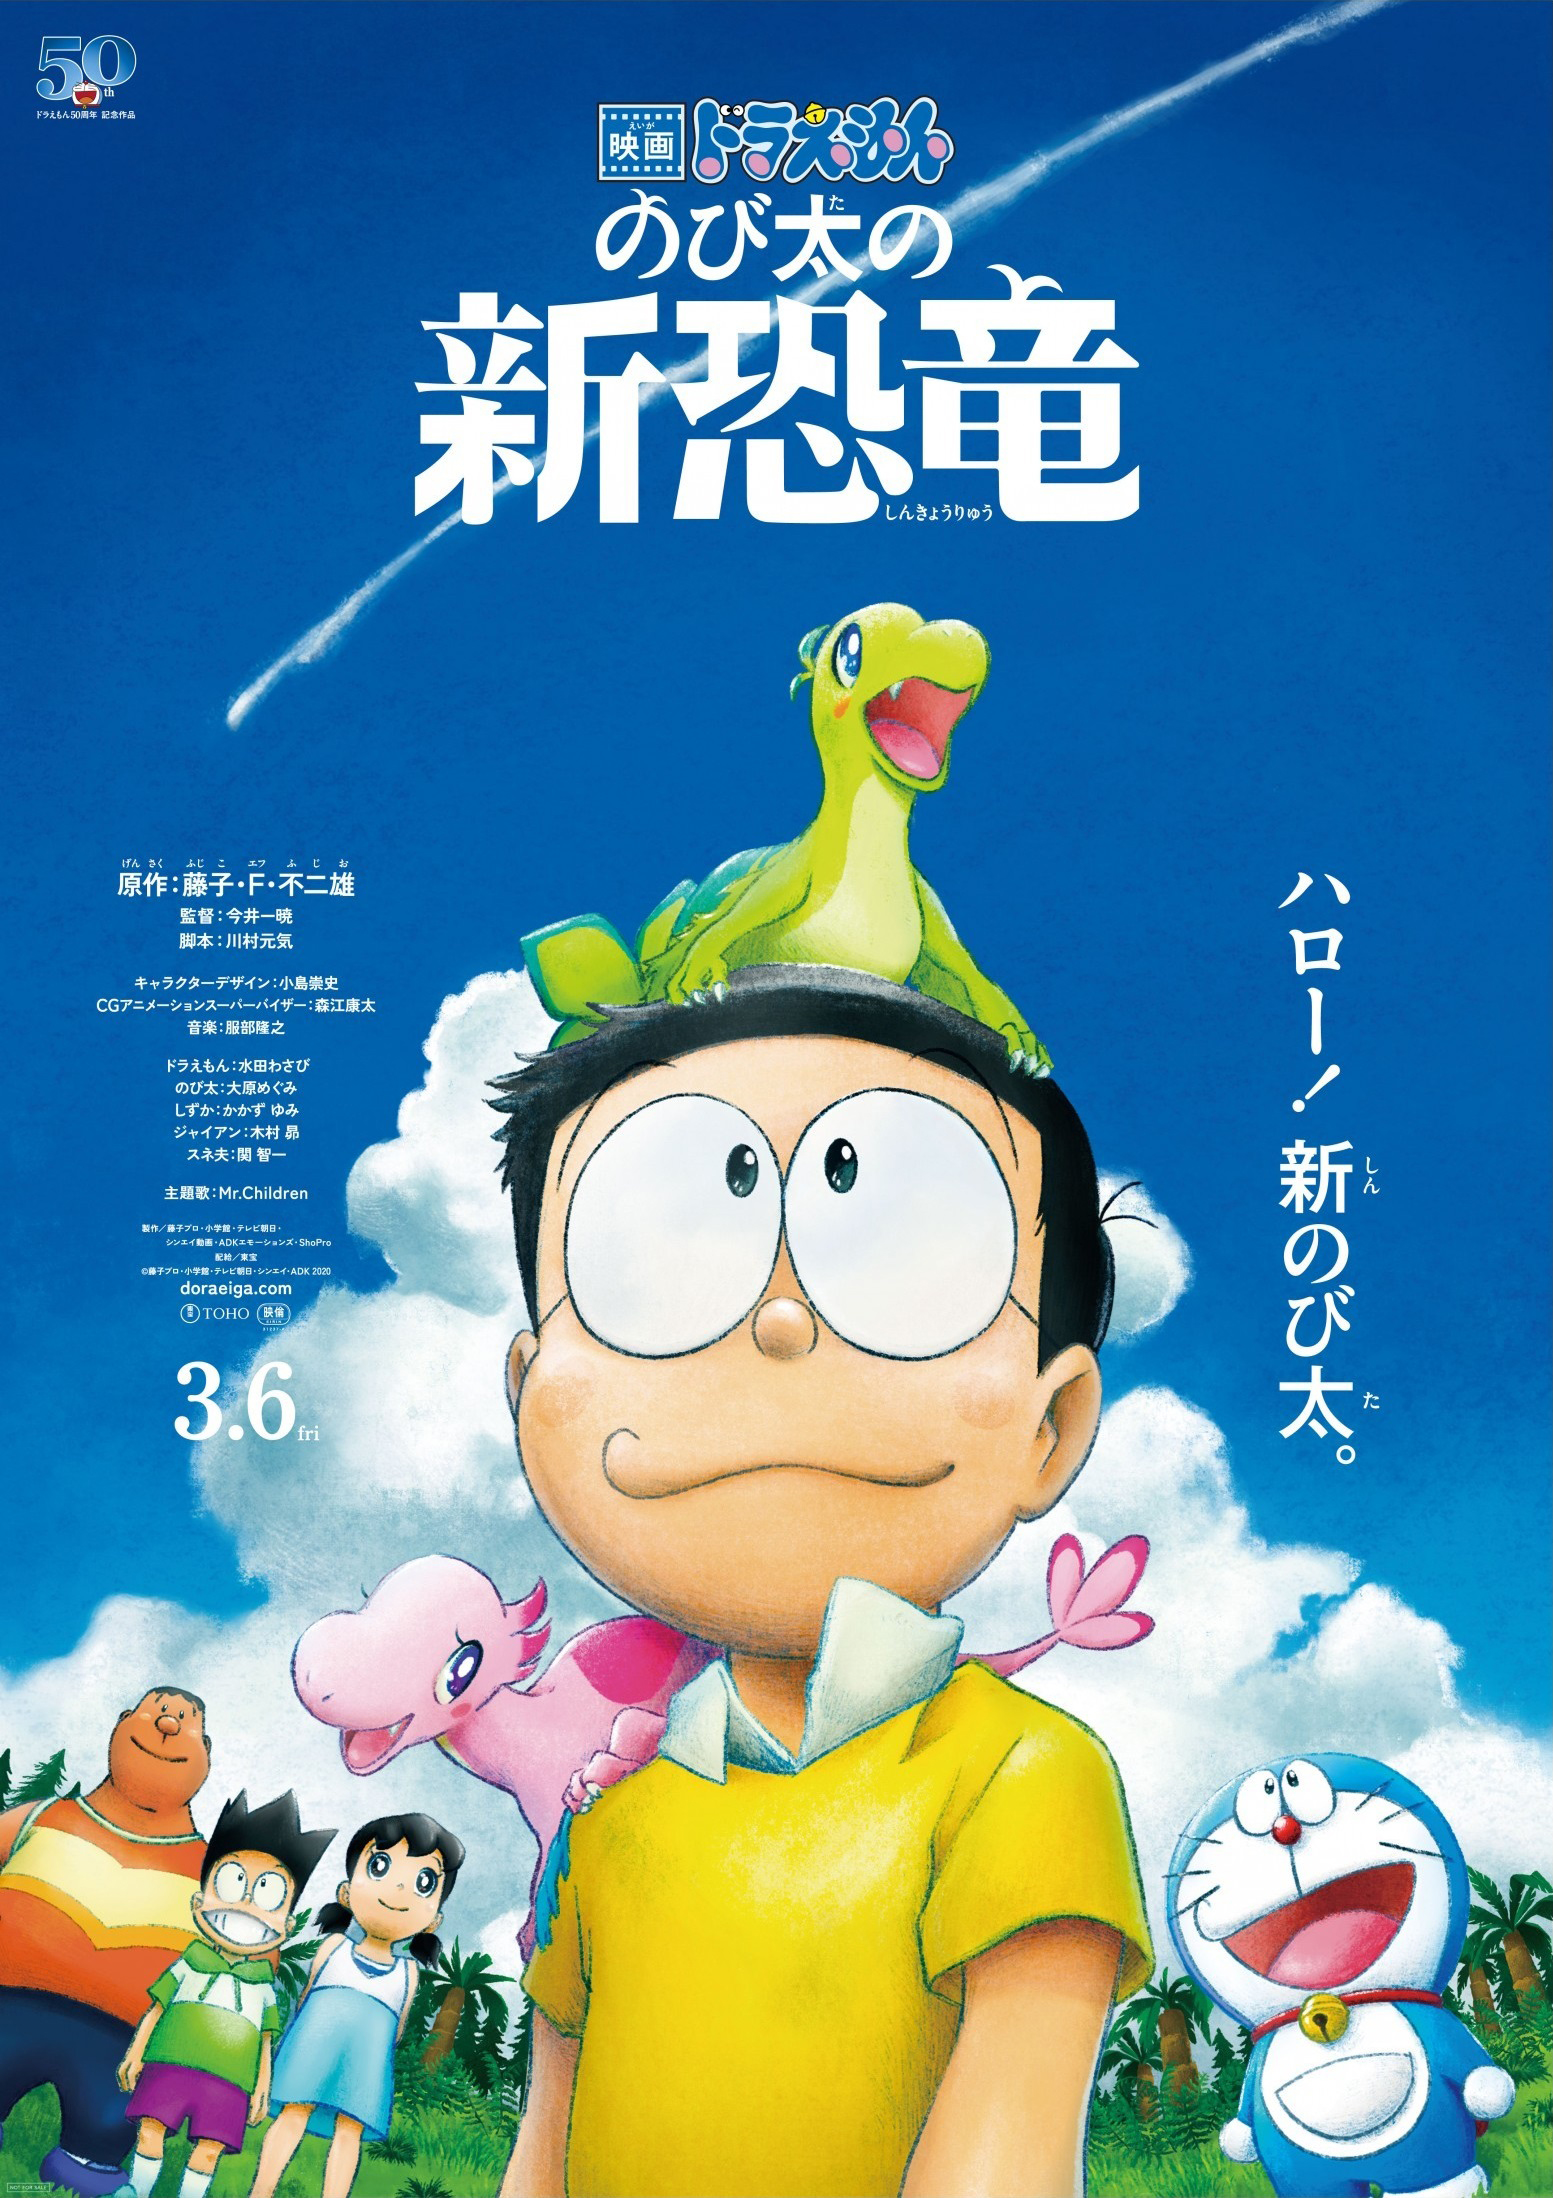 Eiga Doraemon: Nobita no shin kyôryû (2020) - IMDb